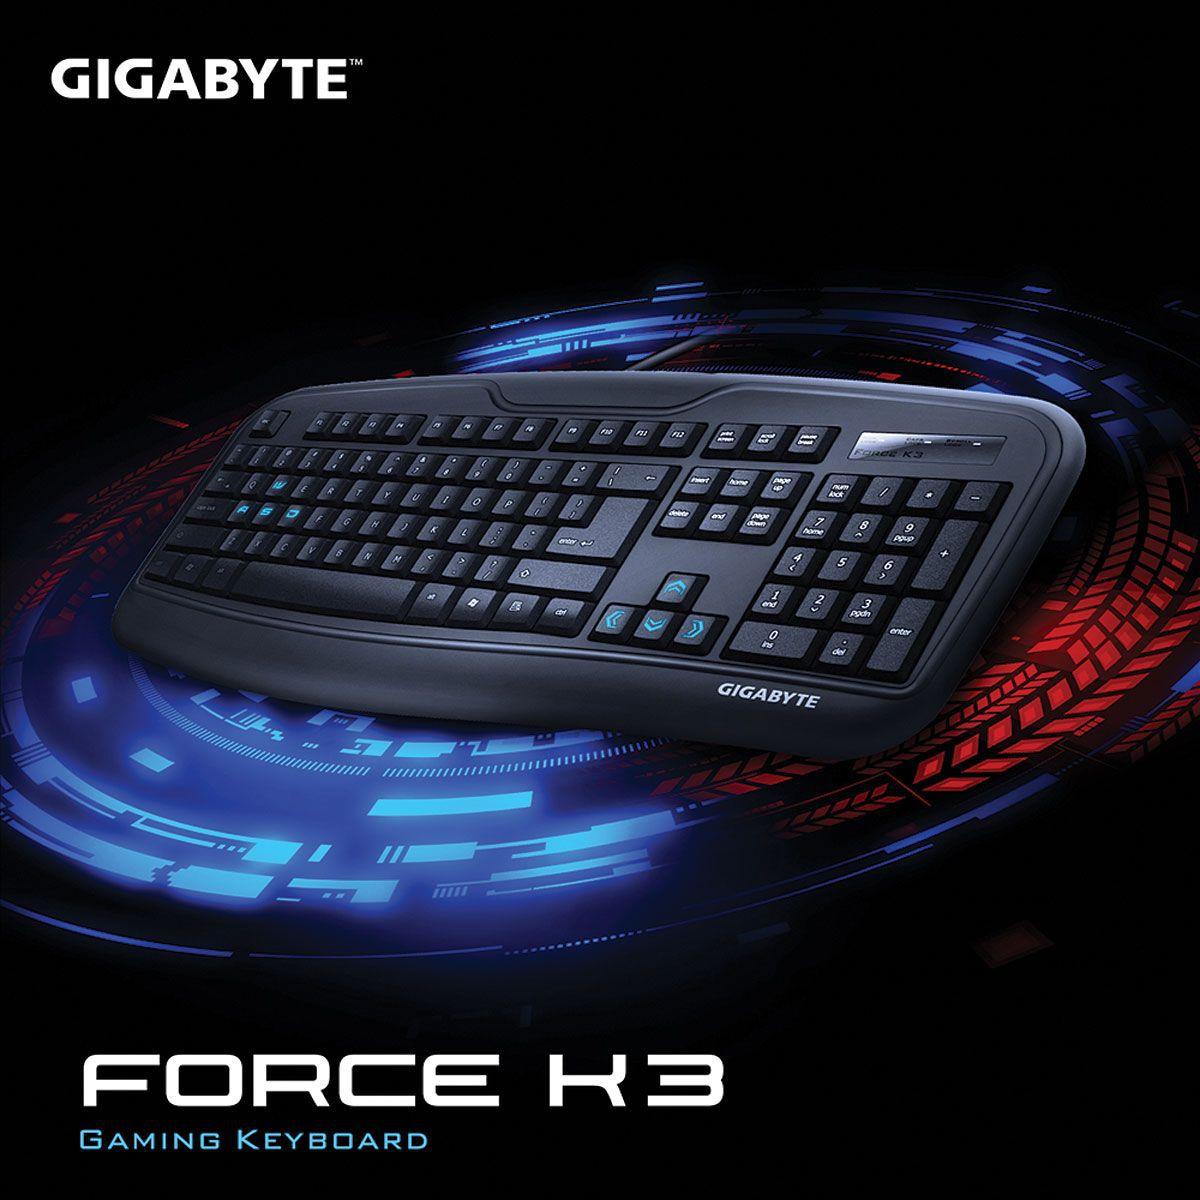 TECLADO GAMING GK-FORCE K3/BR ABNT2 USB PRETO - GIGABYTE